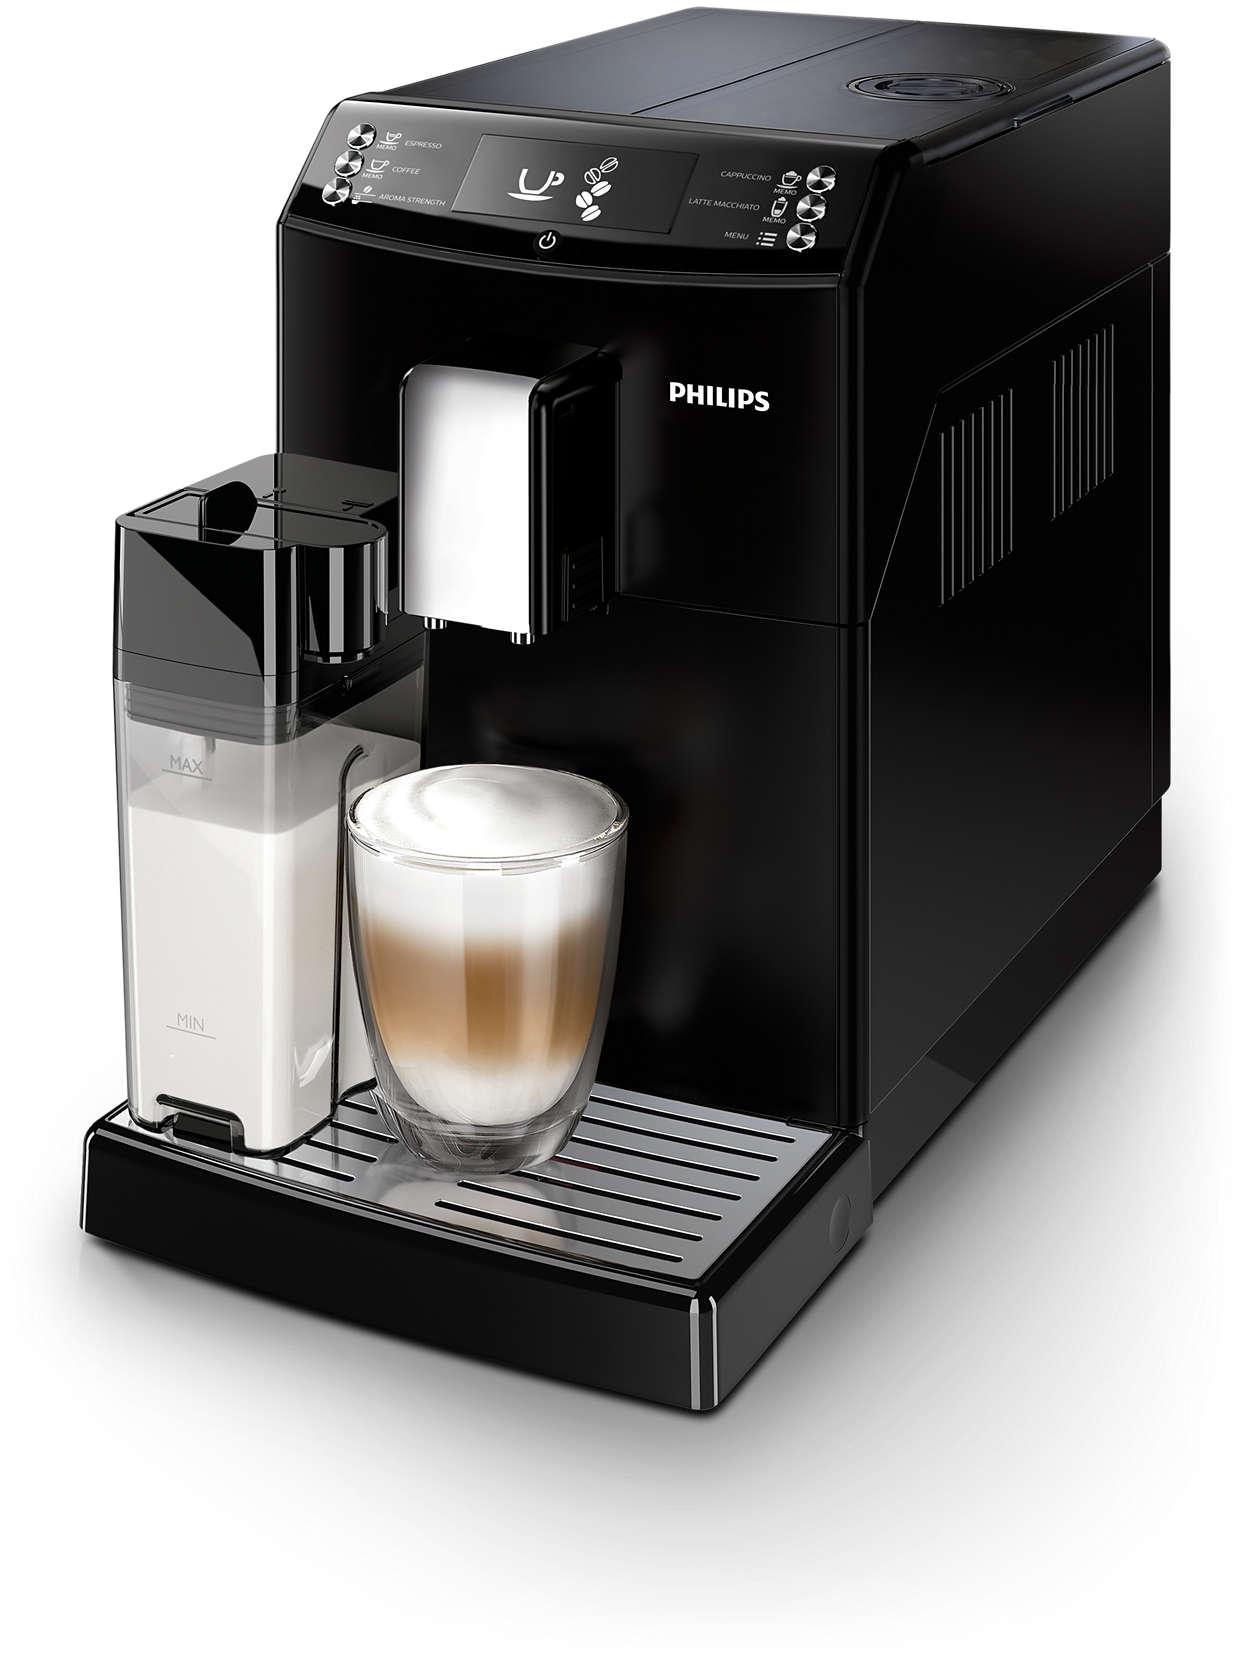 3100 series kaffeevollautomat ep3551 00 philips. Black Bedroom Furniture Sets. Home Design Ideas